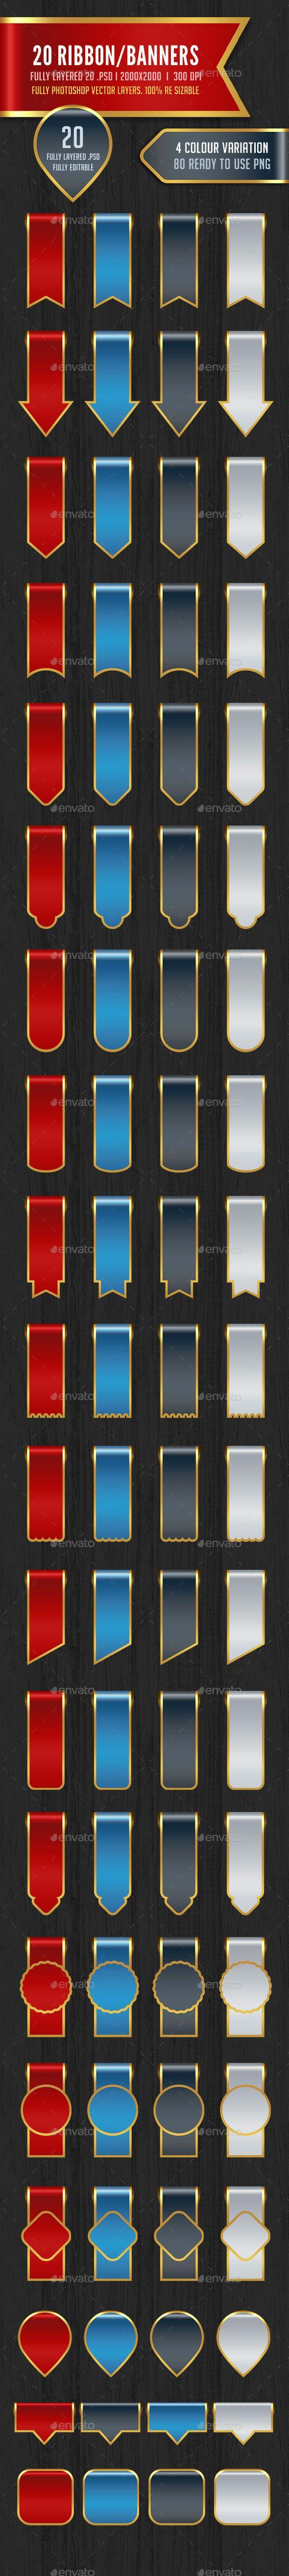 80 Ribbon / Banners